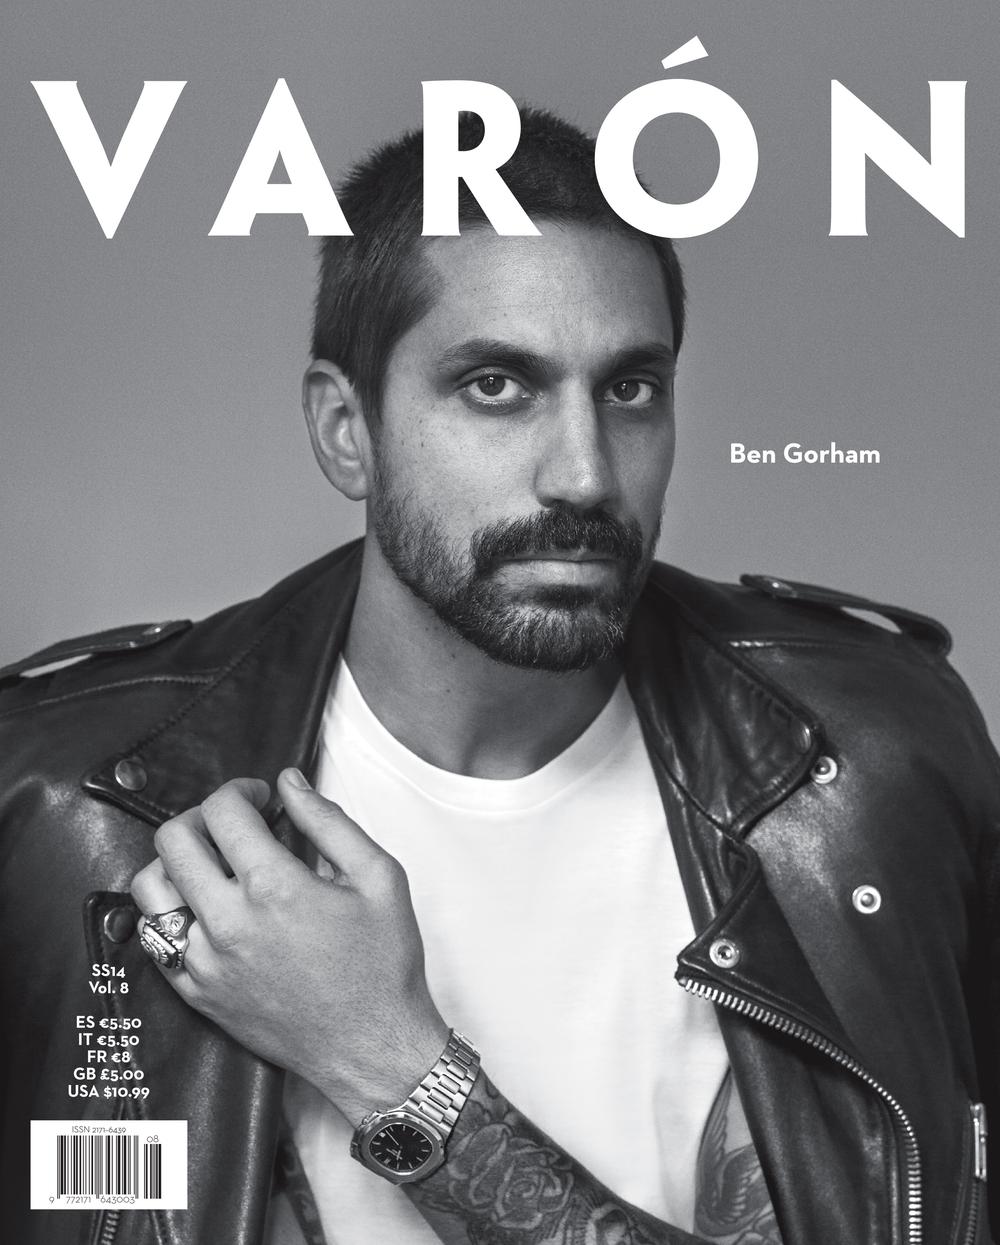 Ben Gorham Varon Vol. 8 SS14